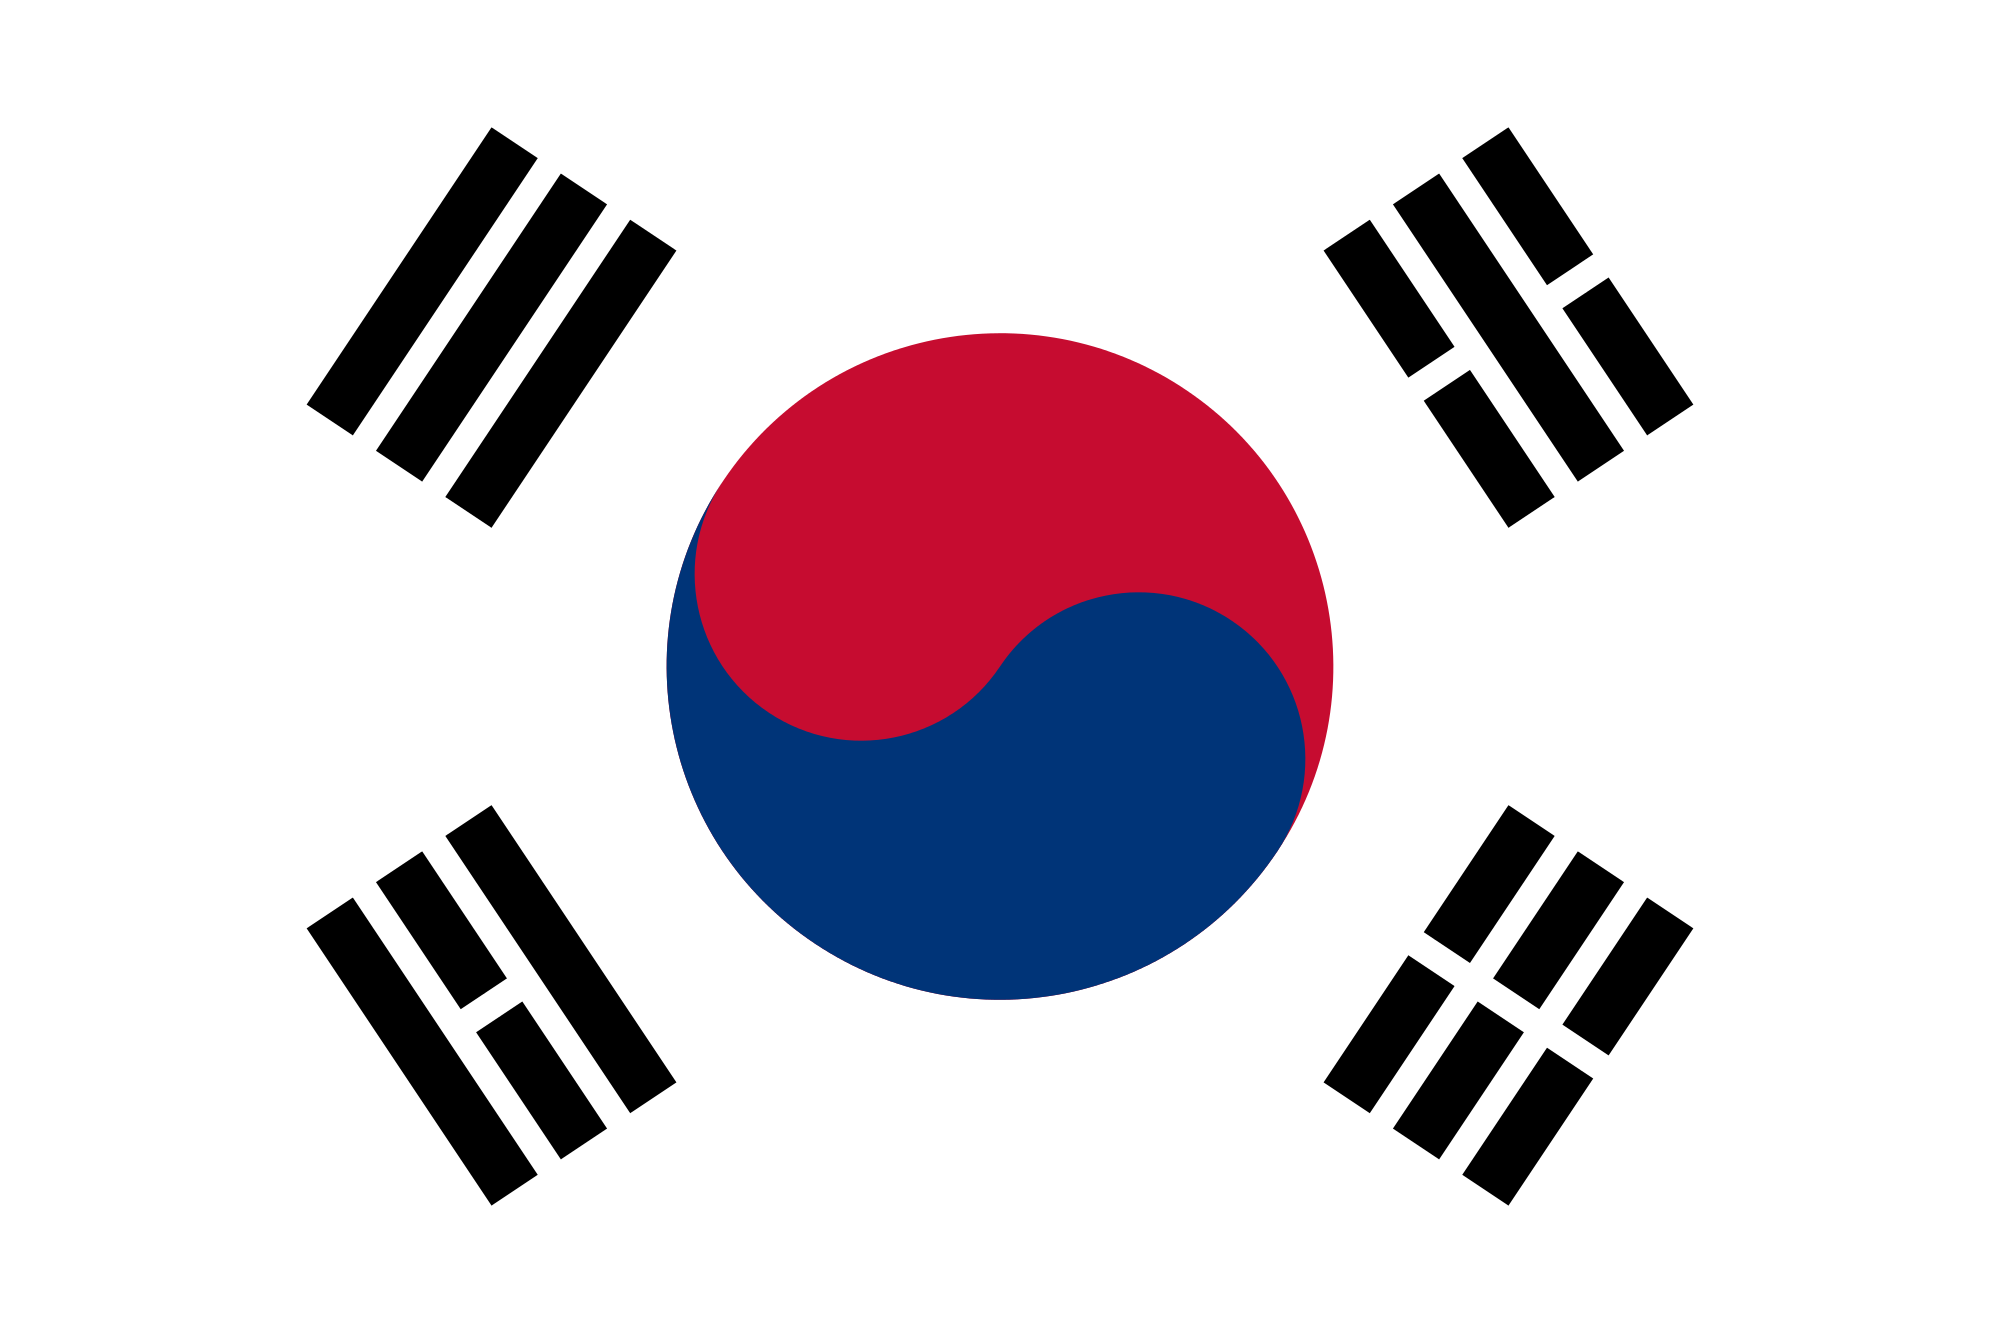 Sth Korea